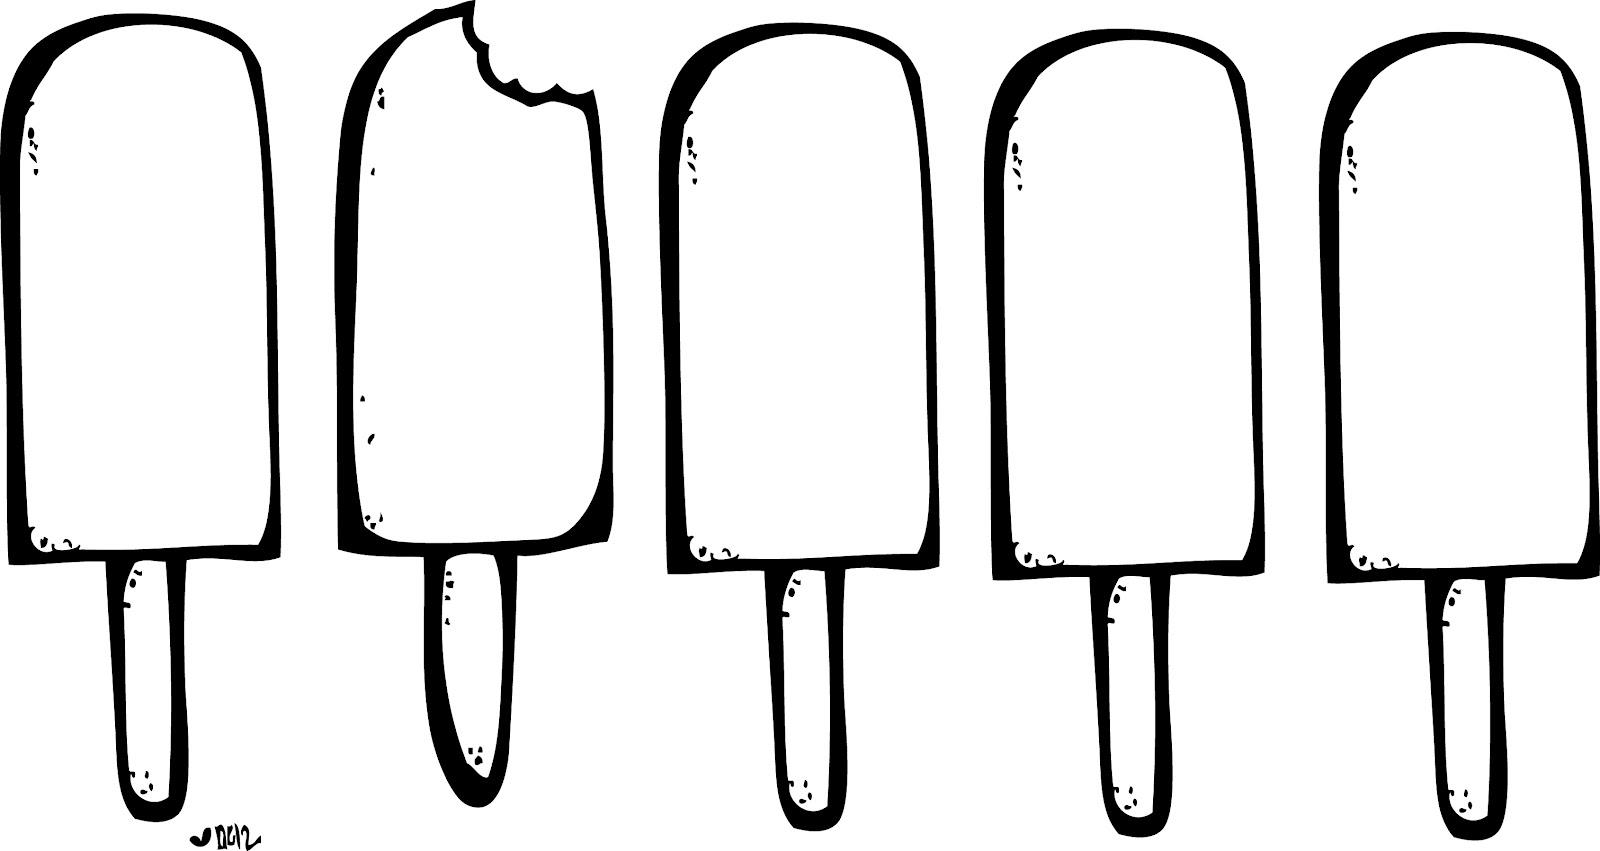 Melting Ice Cream Cone Clipart Black And White